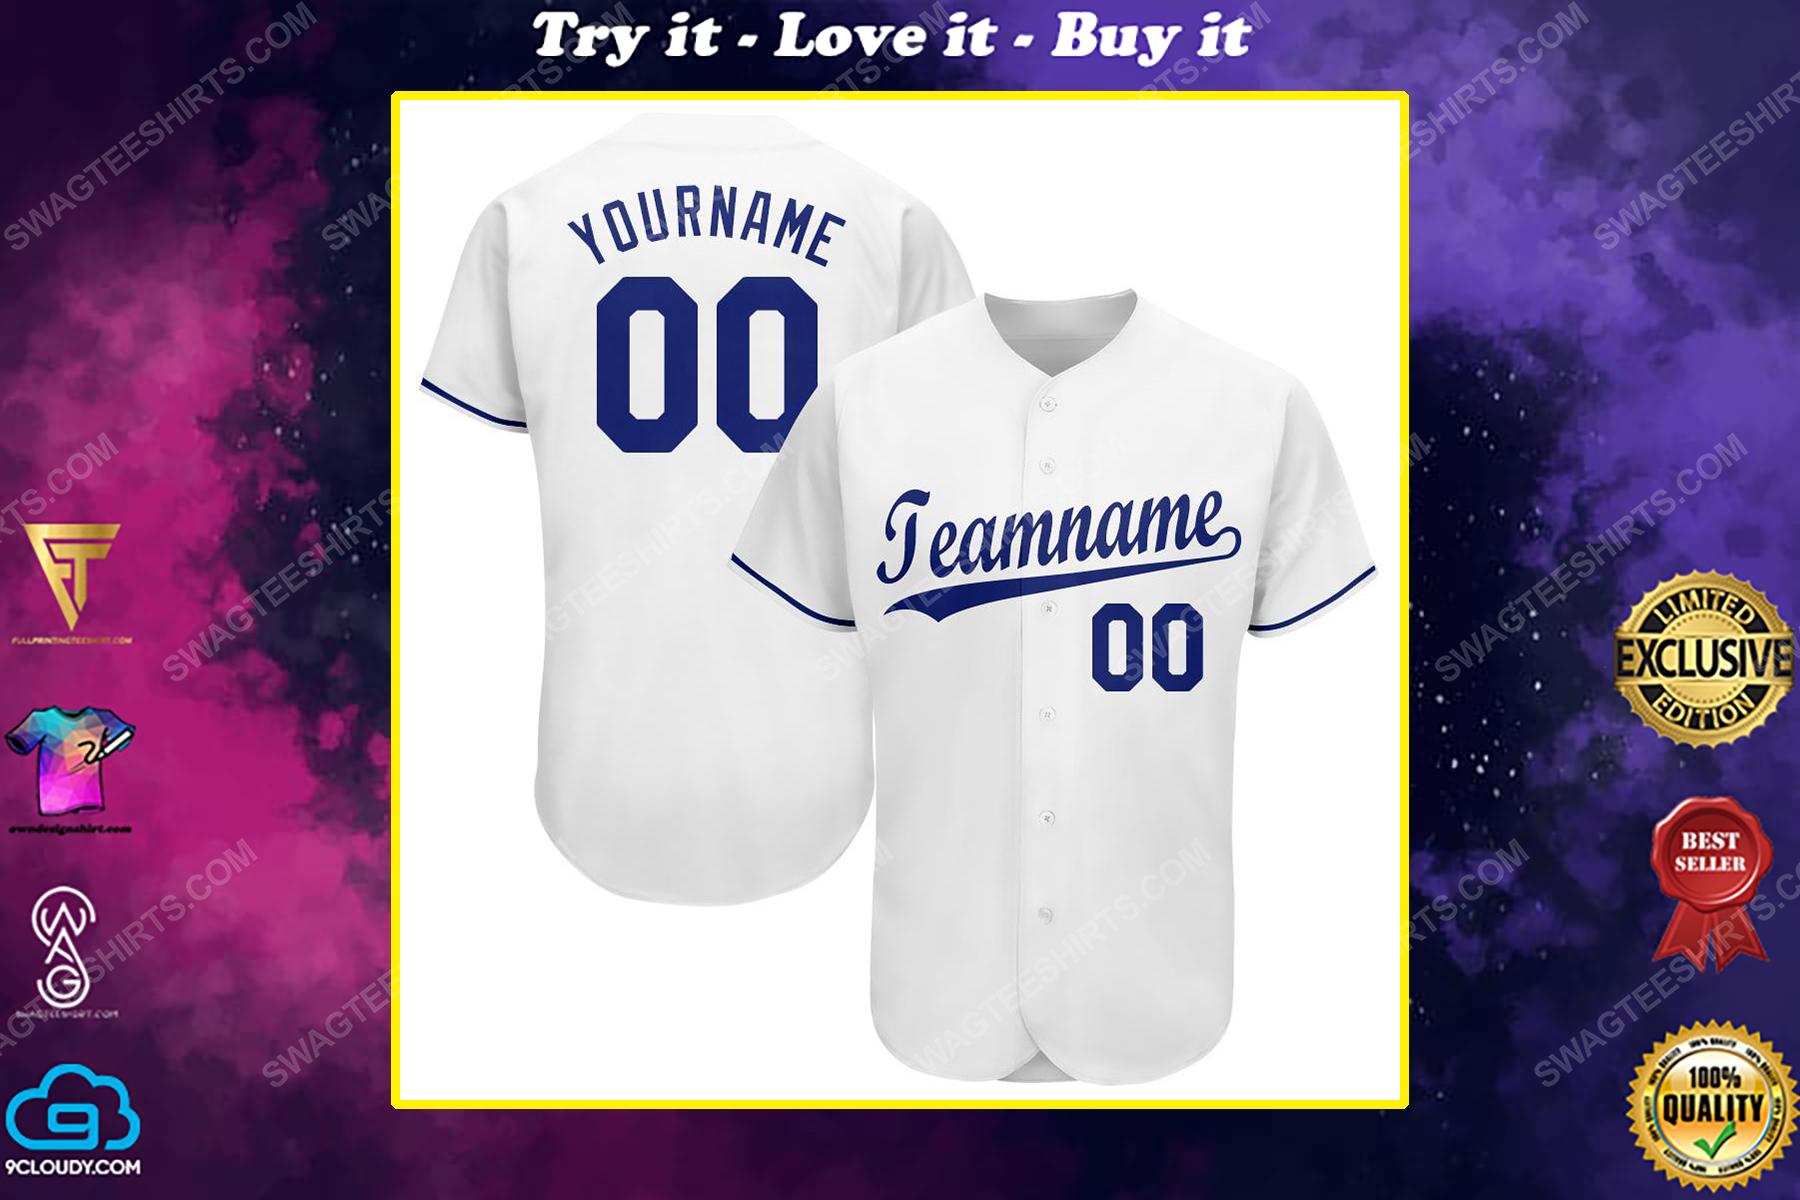 Custom team name kansas city royals major league baseball baseball jersey